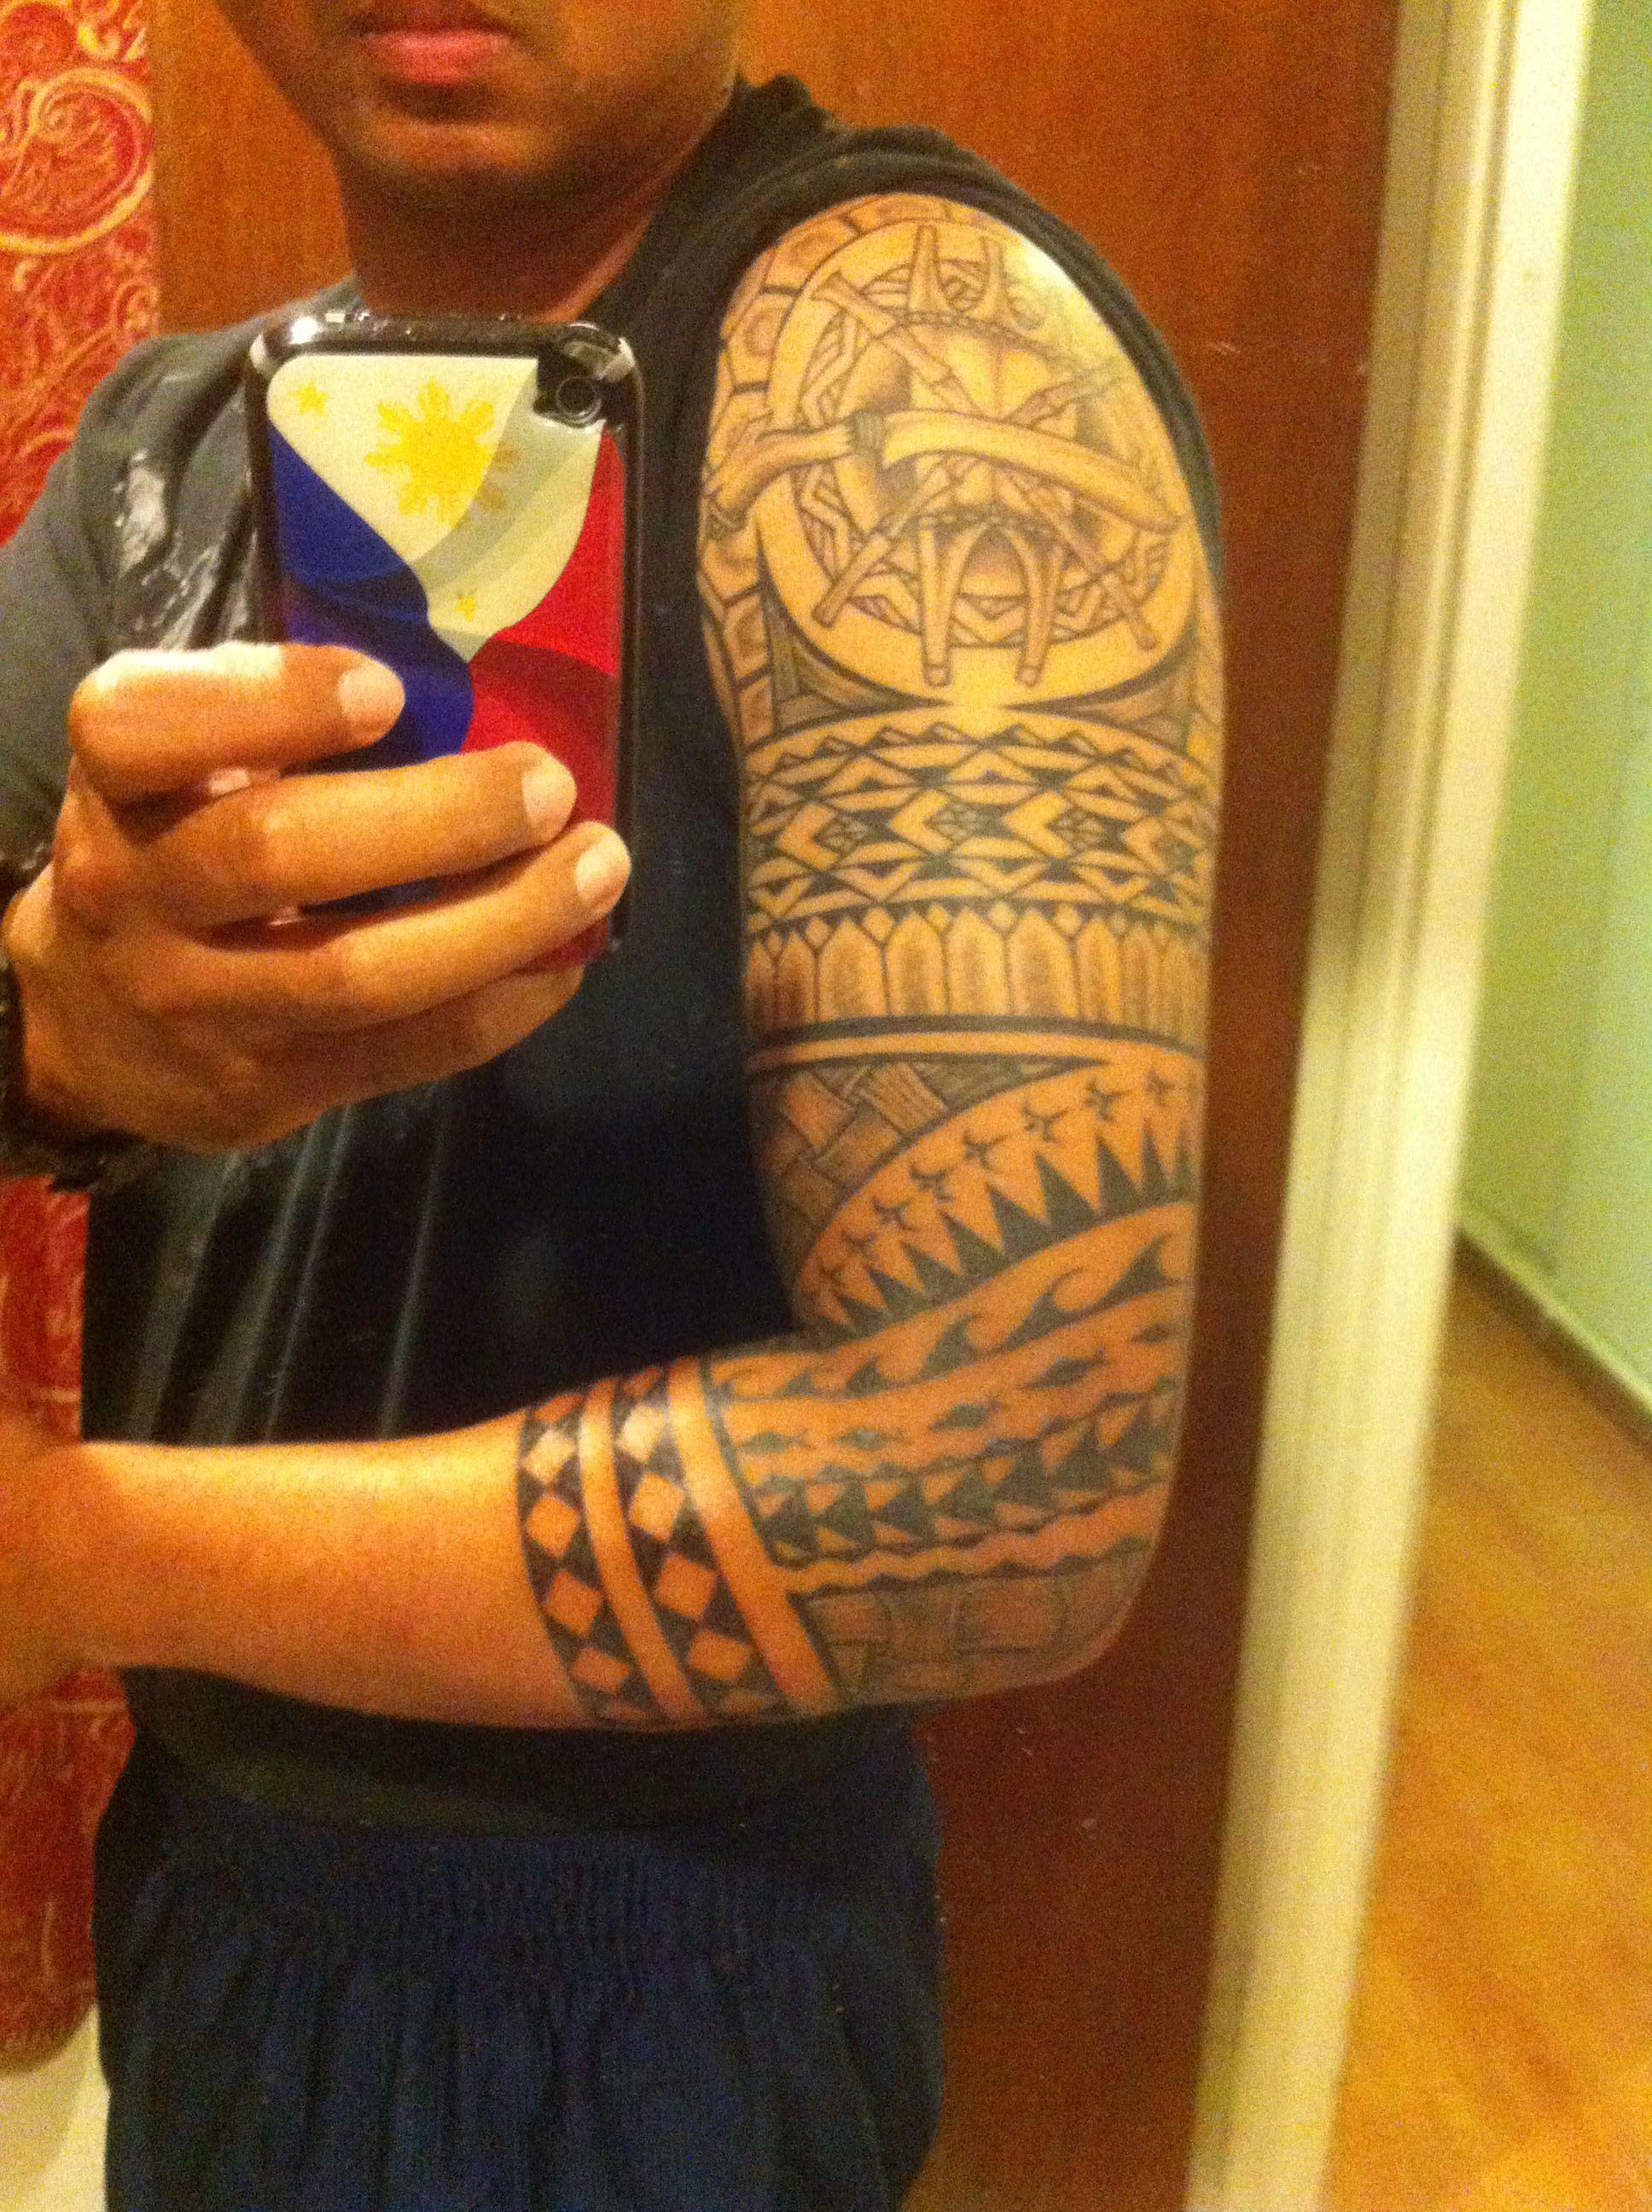 filipino tribal tattoo filipino tribal tattoo pinterest tribal tattoos filipino tribal. Black Bedroom Furniture Sets. Home Design Ideas